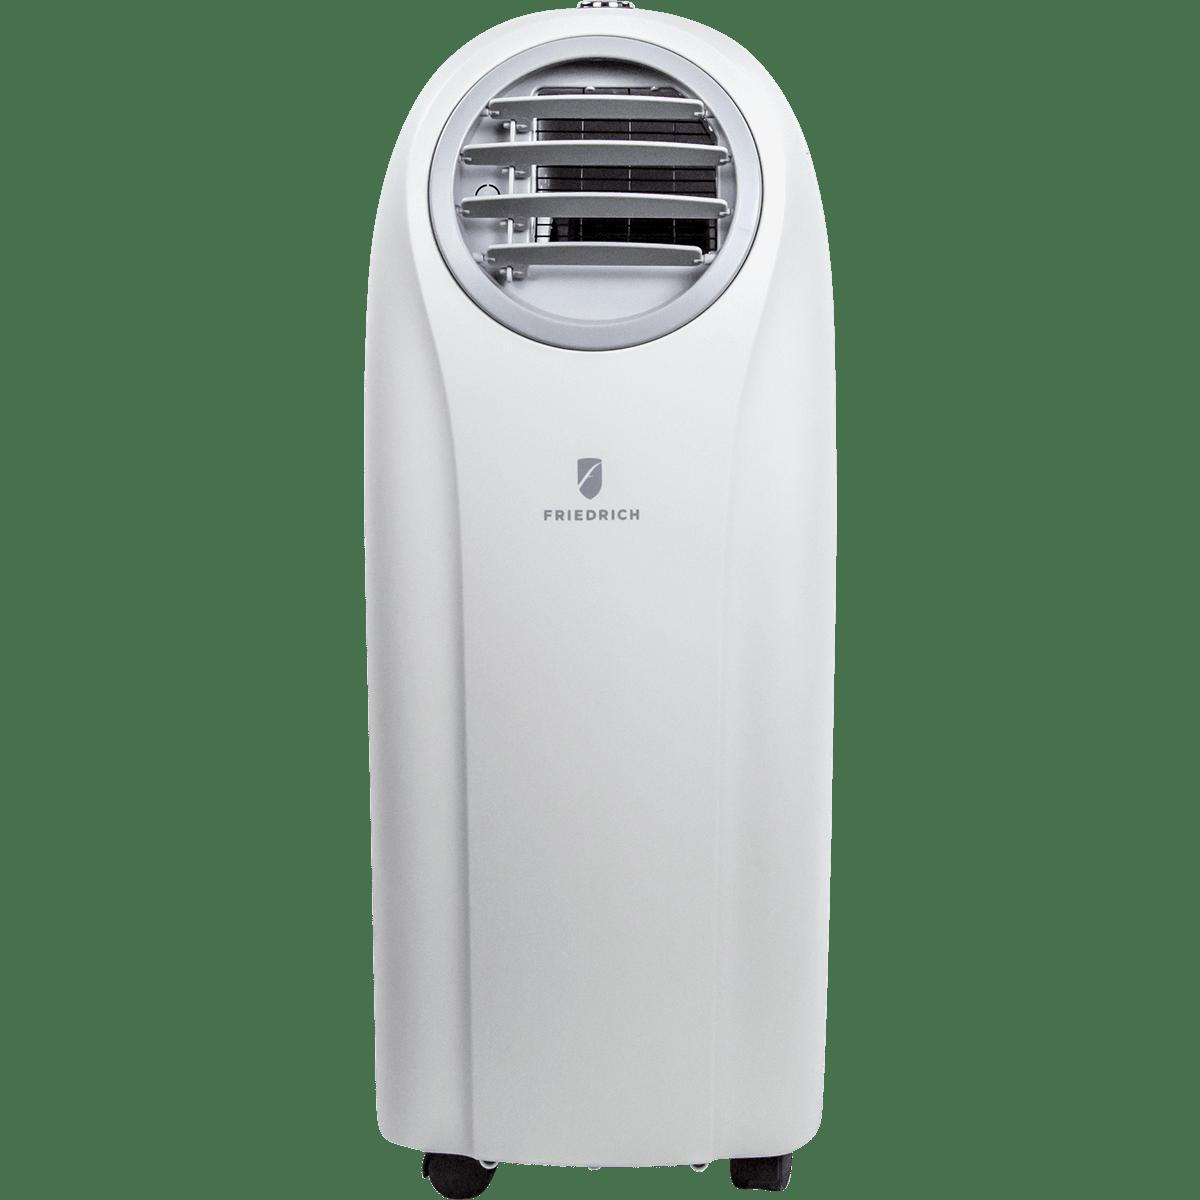 Friedrich P10s Btu Portable Air Conditioner Sylvane Conditioners Wiring Diagram P10sa